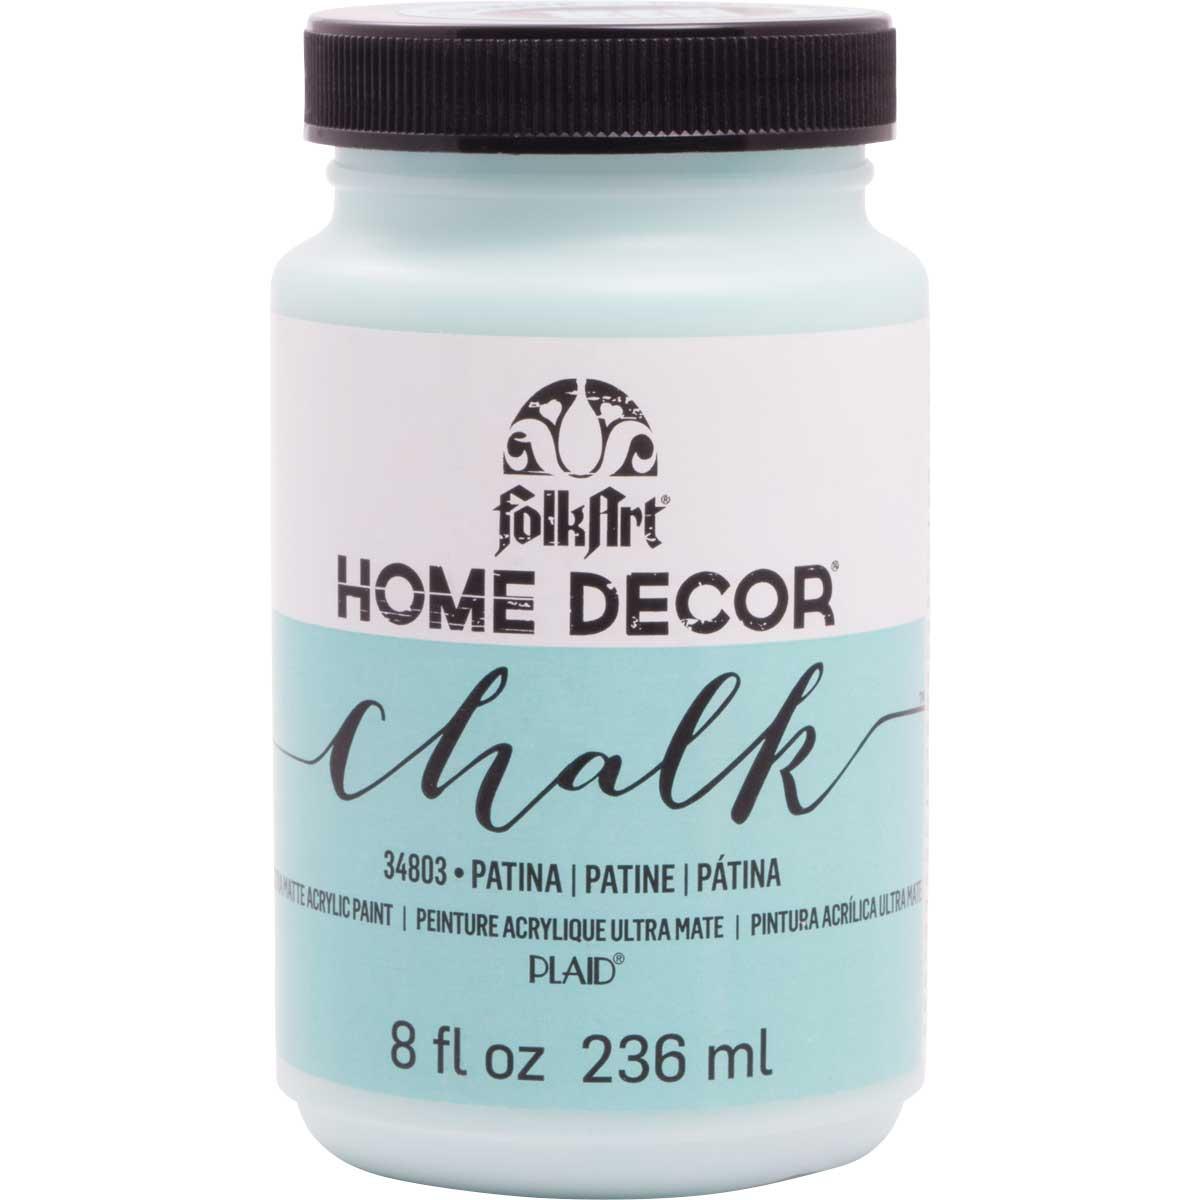 FolkArt ® Home Decor™ Chalk - Patina, 8 oz. - 34803